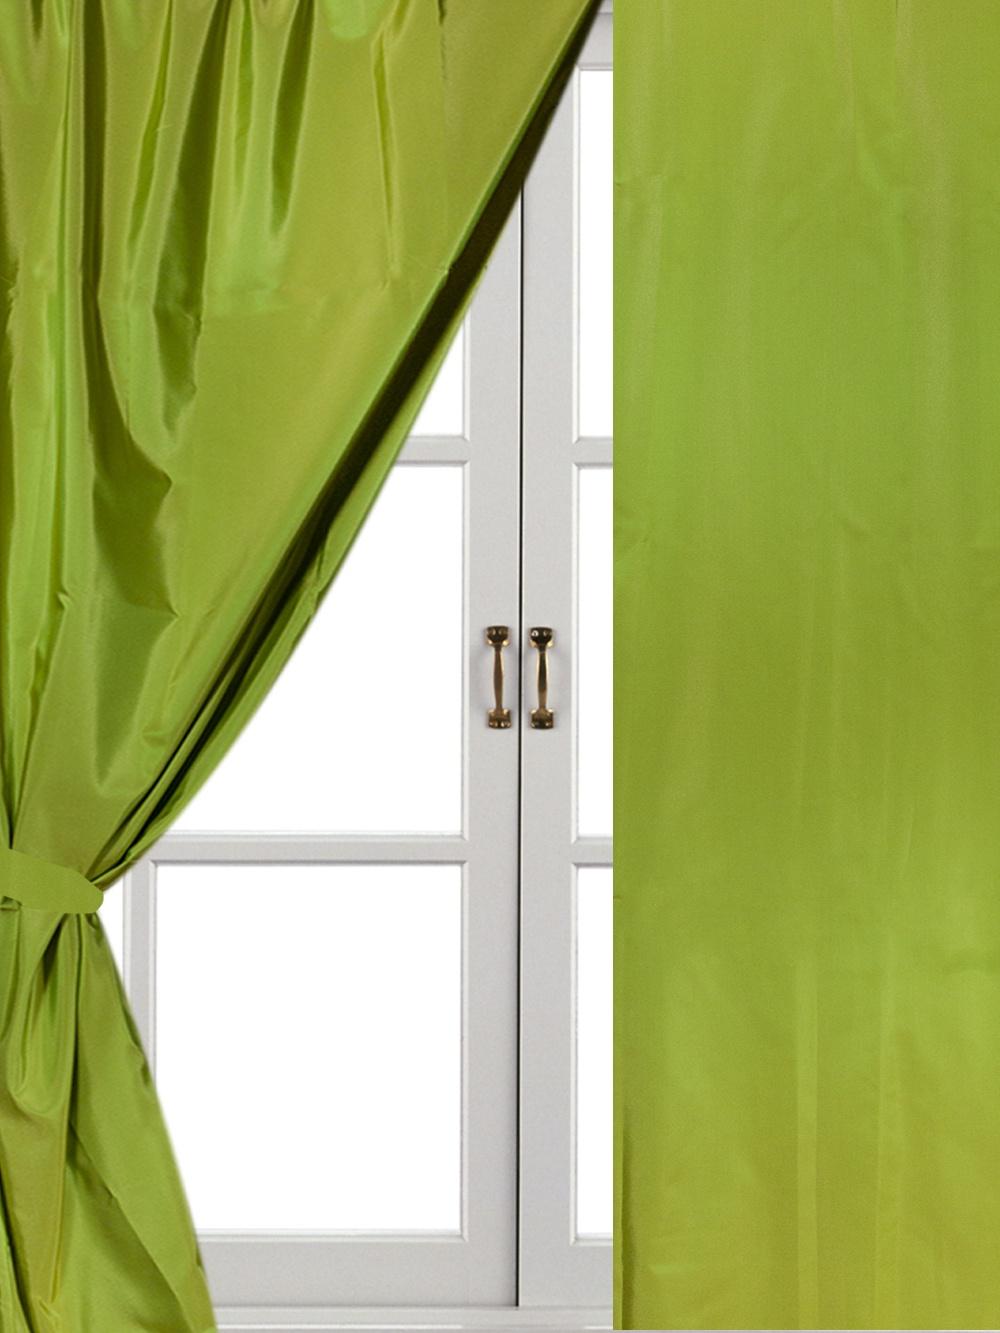 Шторы комнатные Айлант ОБ38 шторы homedeco нитяные шторы яркие кольца